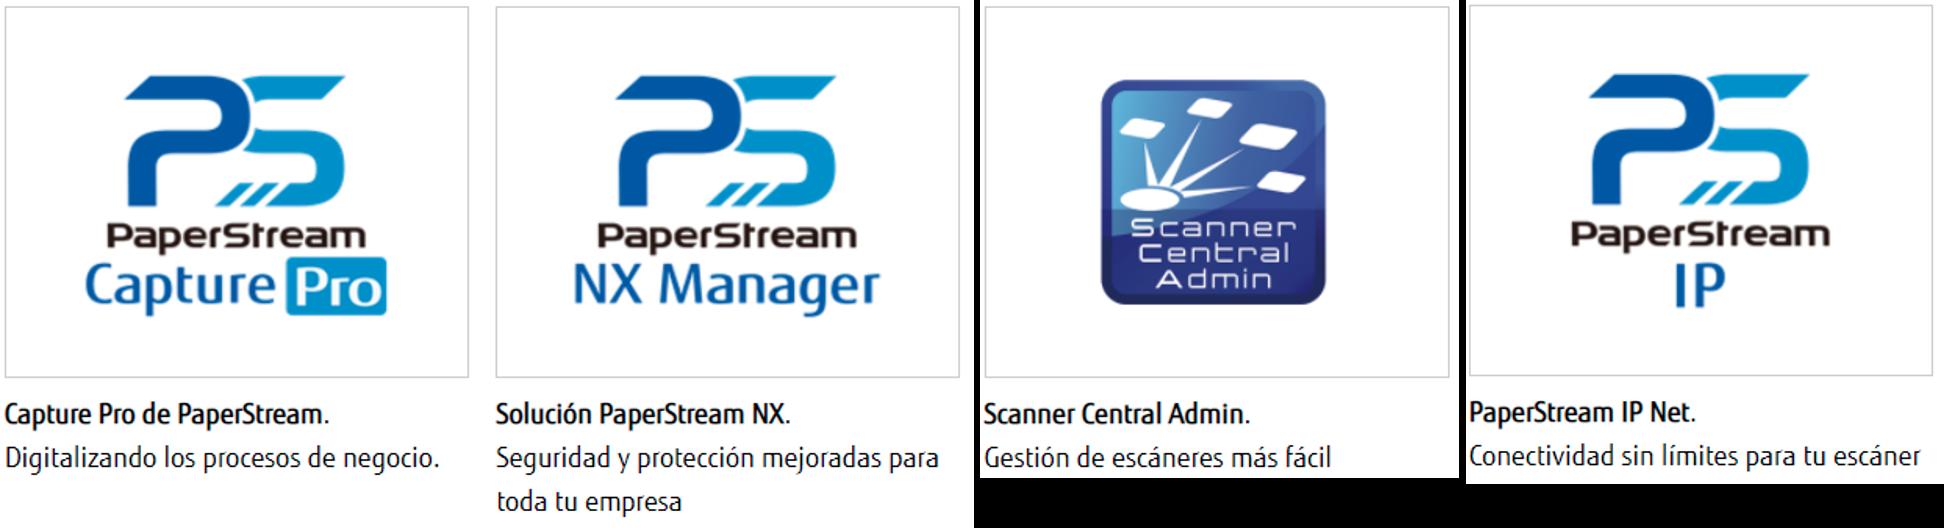 General Licenciamiento PaperStrema .png